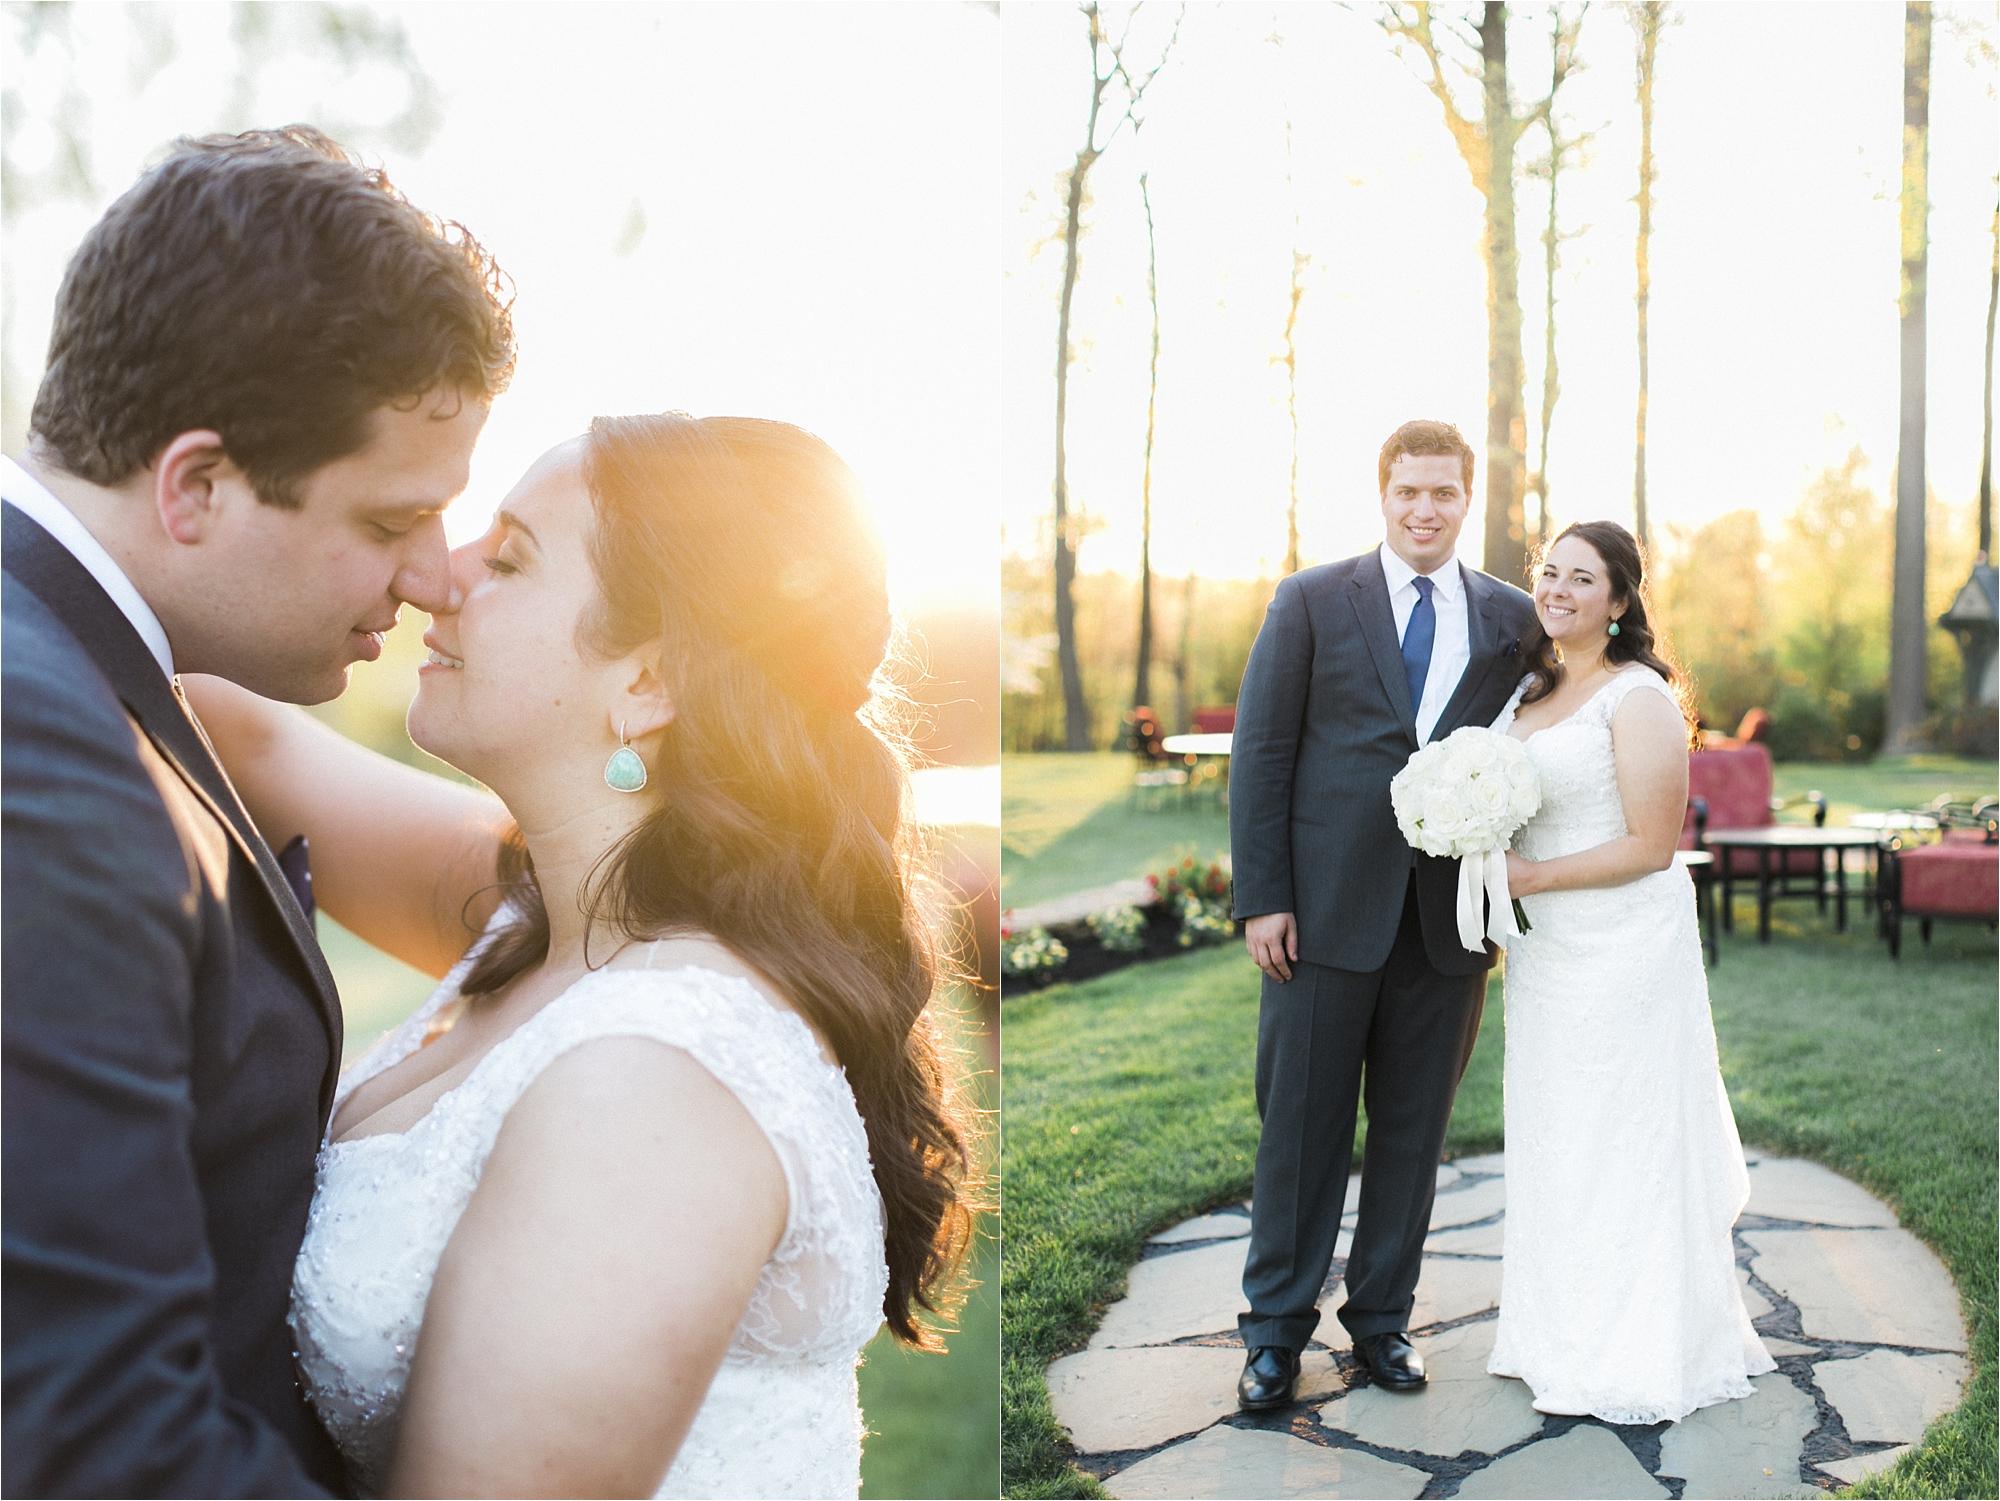 tom-jill-baltimore-maryland-industrial-elegant-wedding-036.JPG